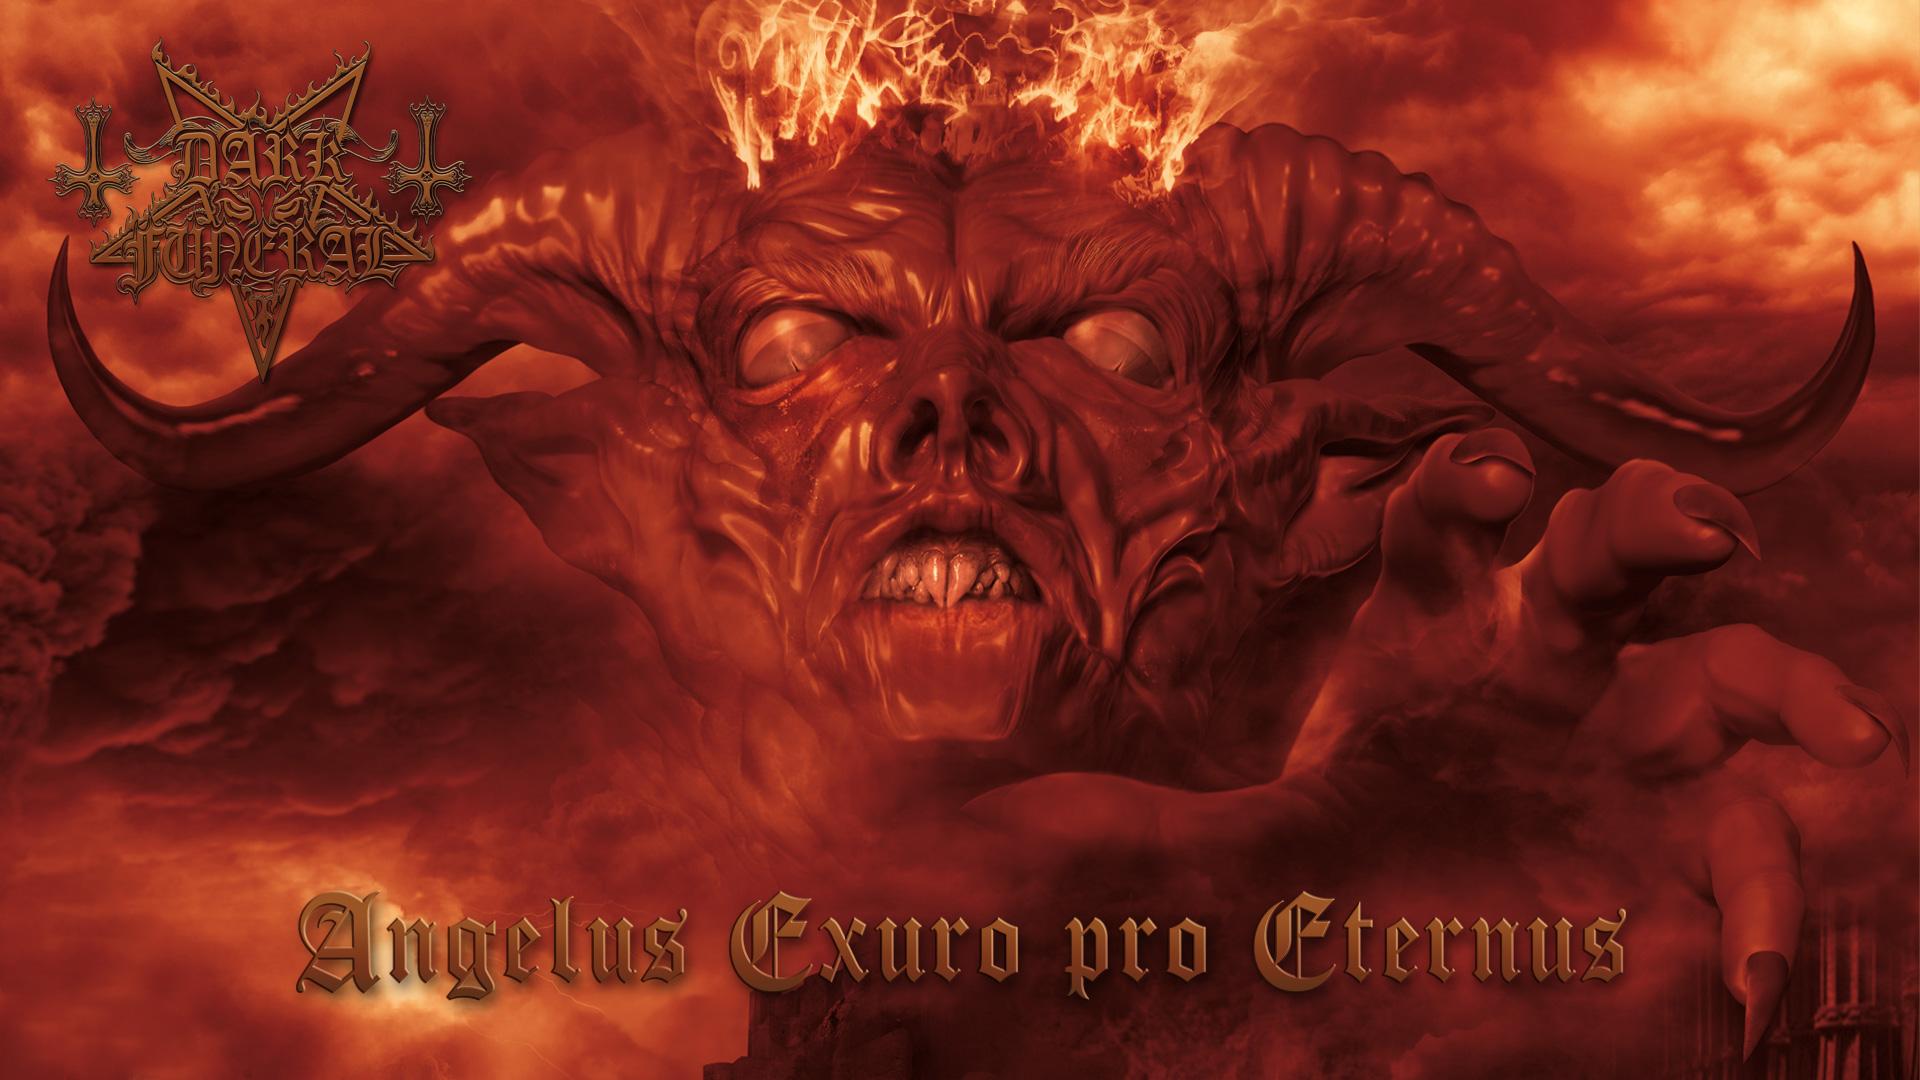 Dark Funeral Hd Wallpaper Background Image 1920x1080